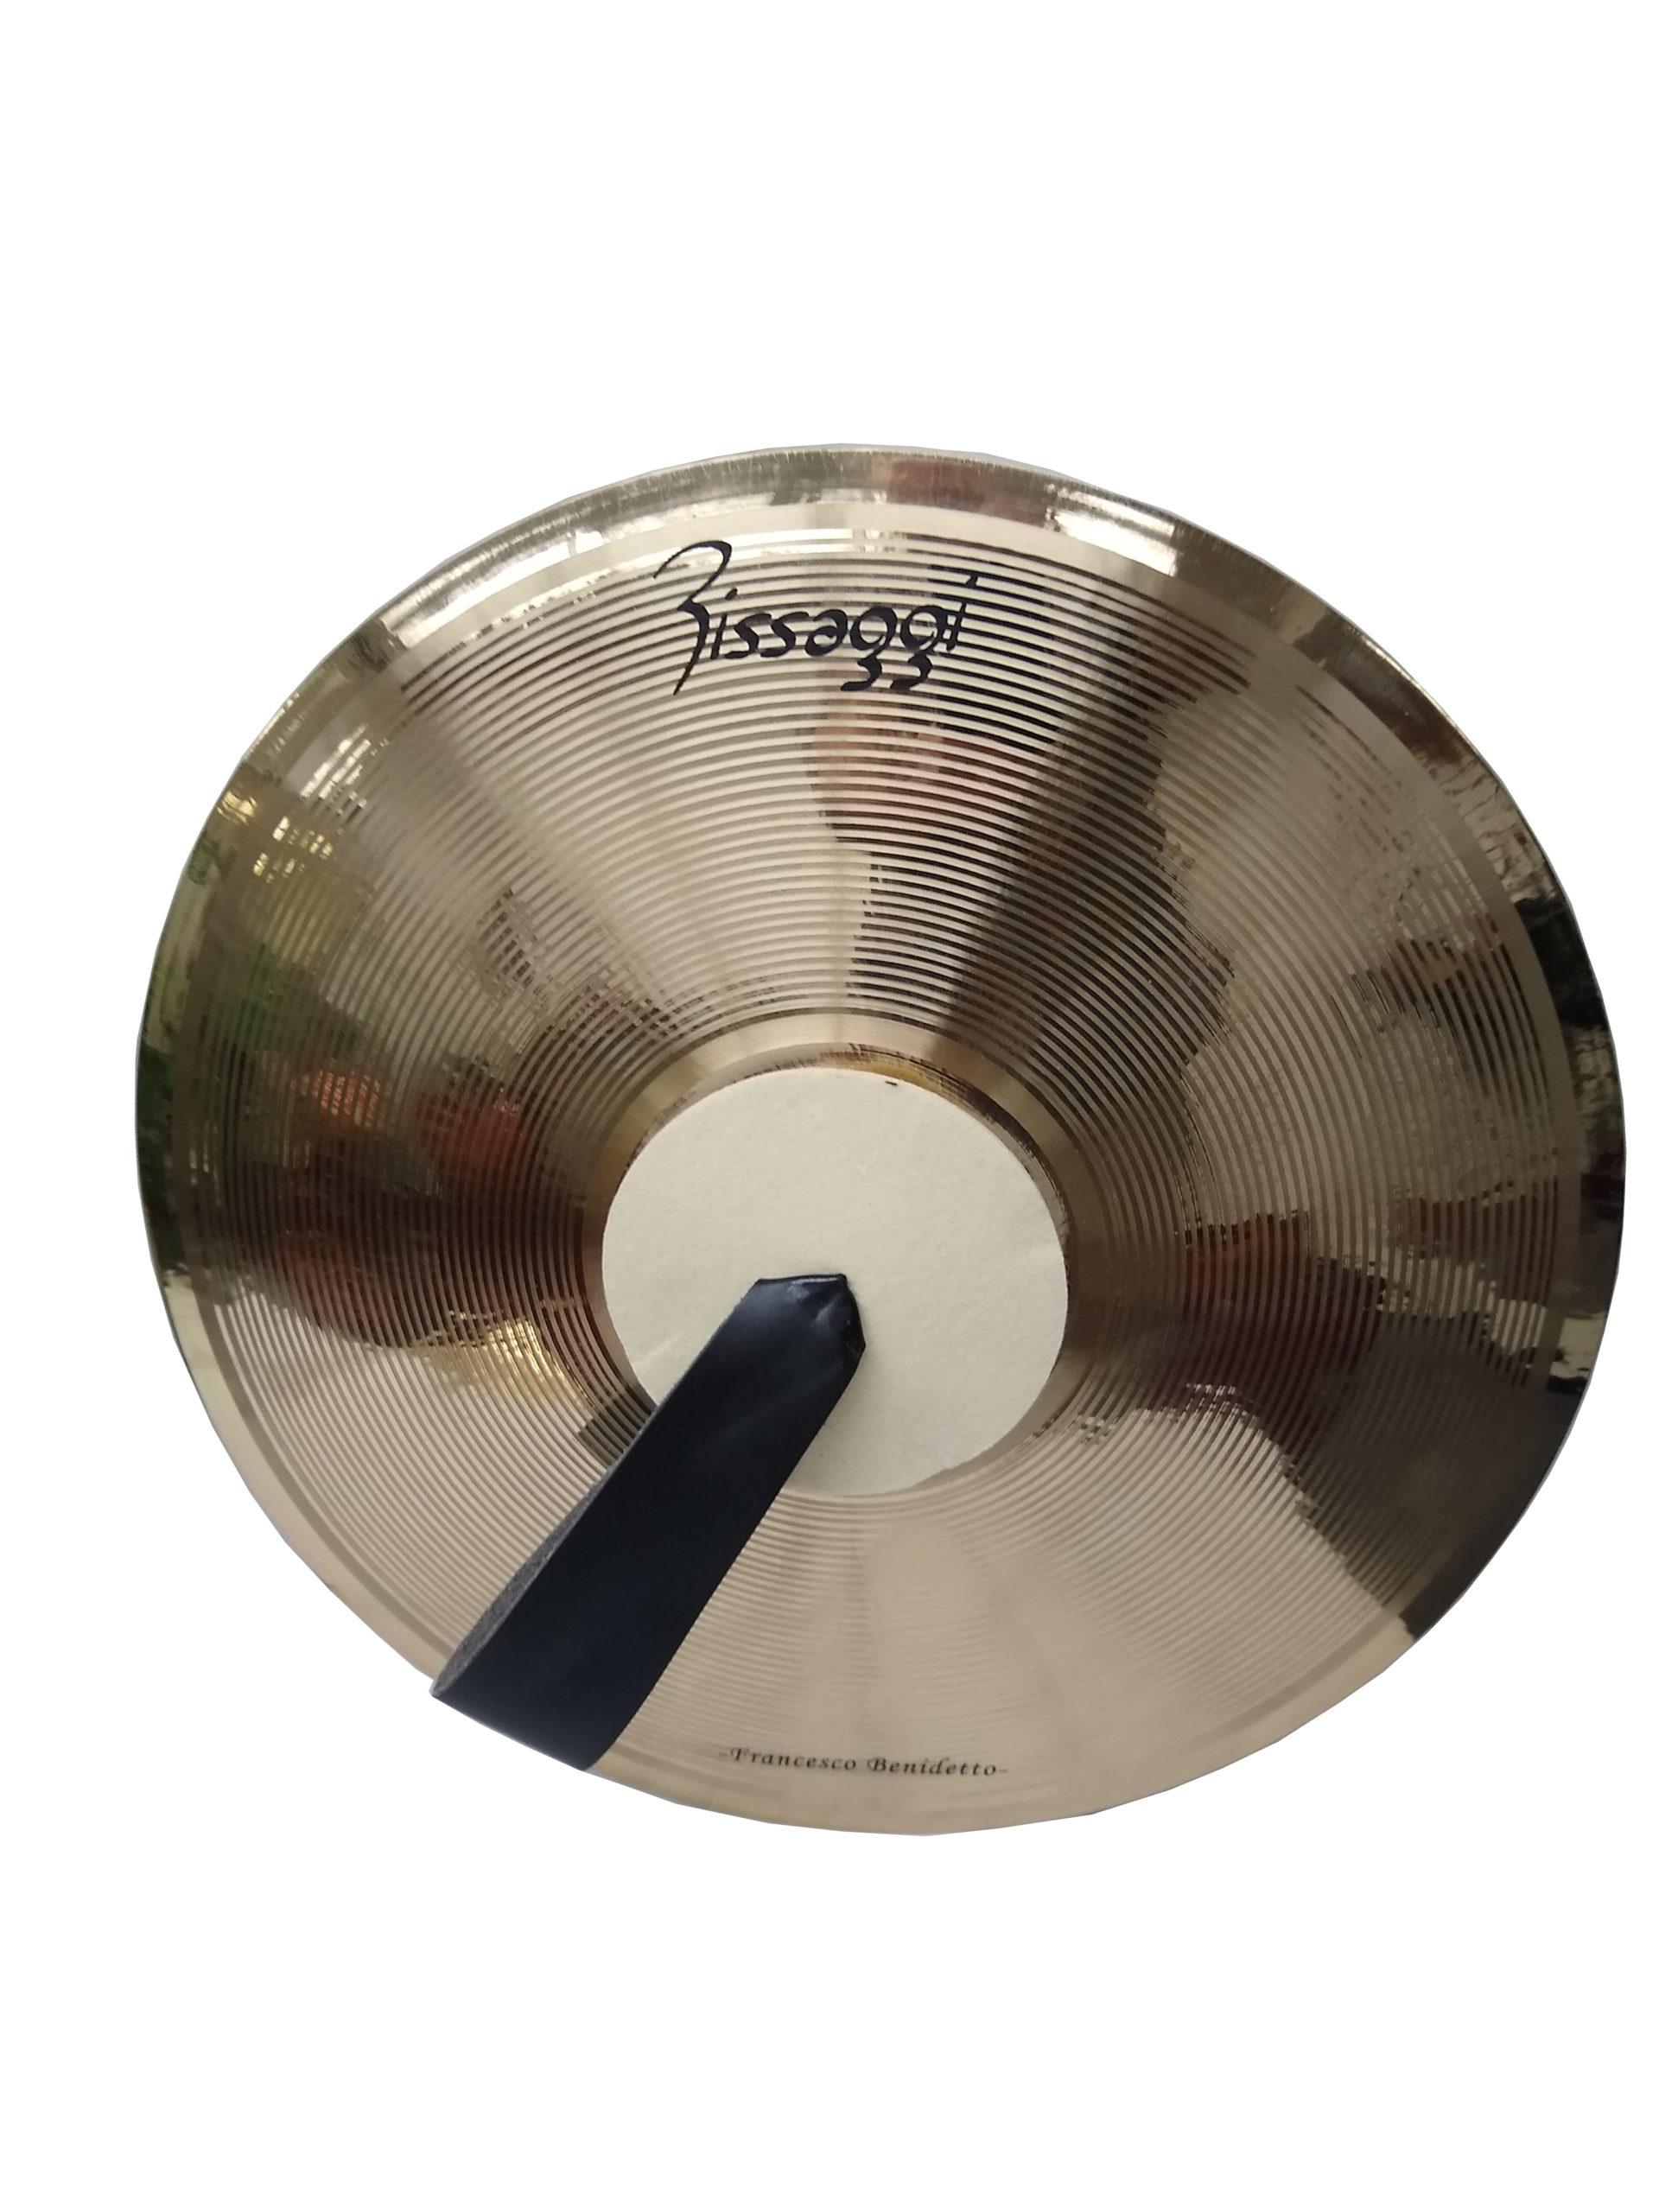 Fissaggi Field Series Marching Cymbals 16